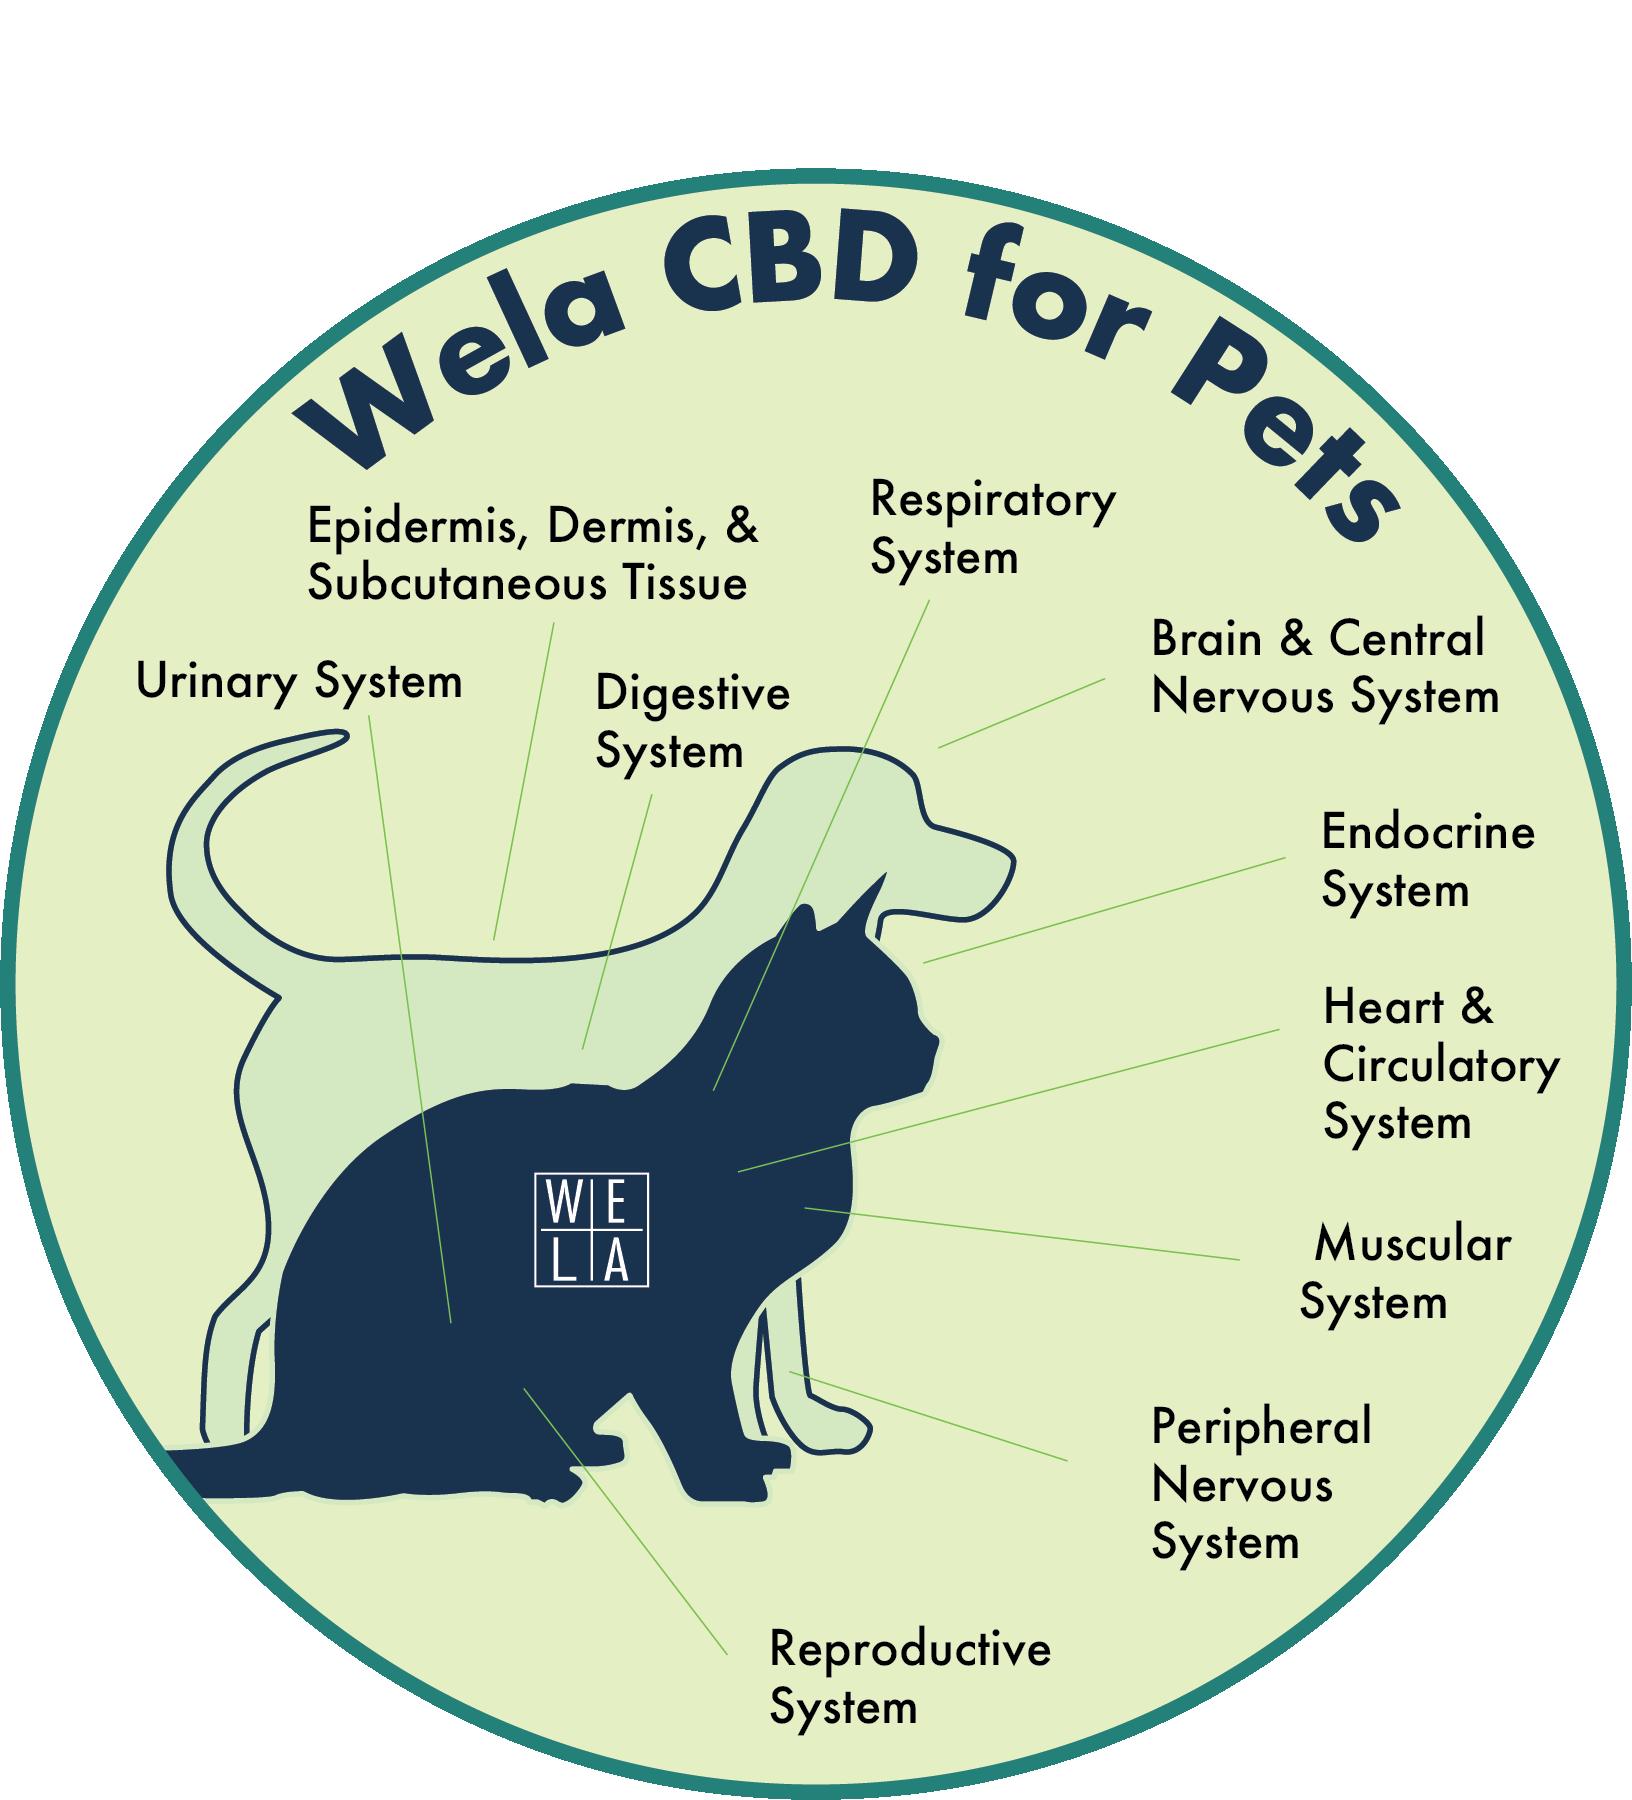 wela cbd for pets.png